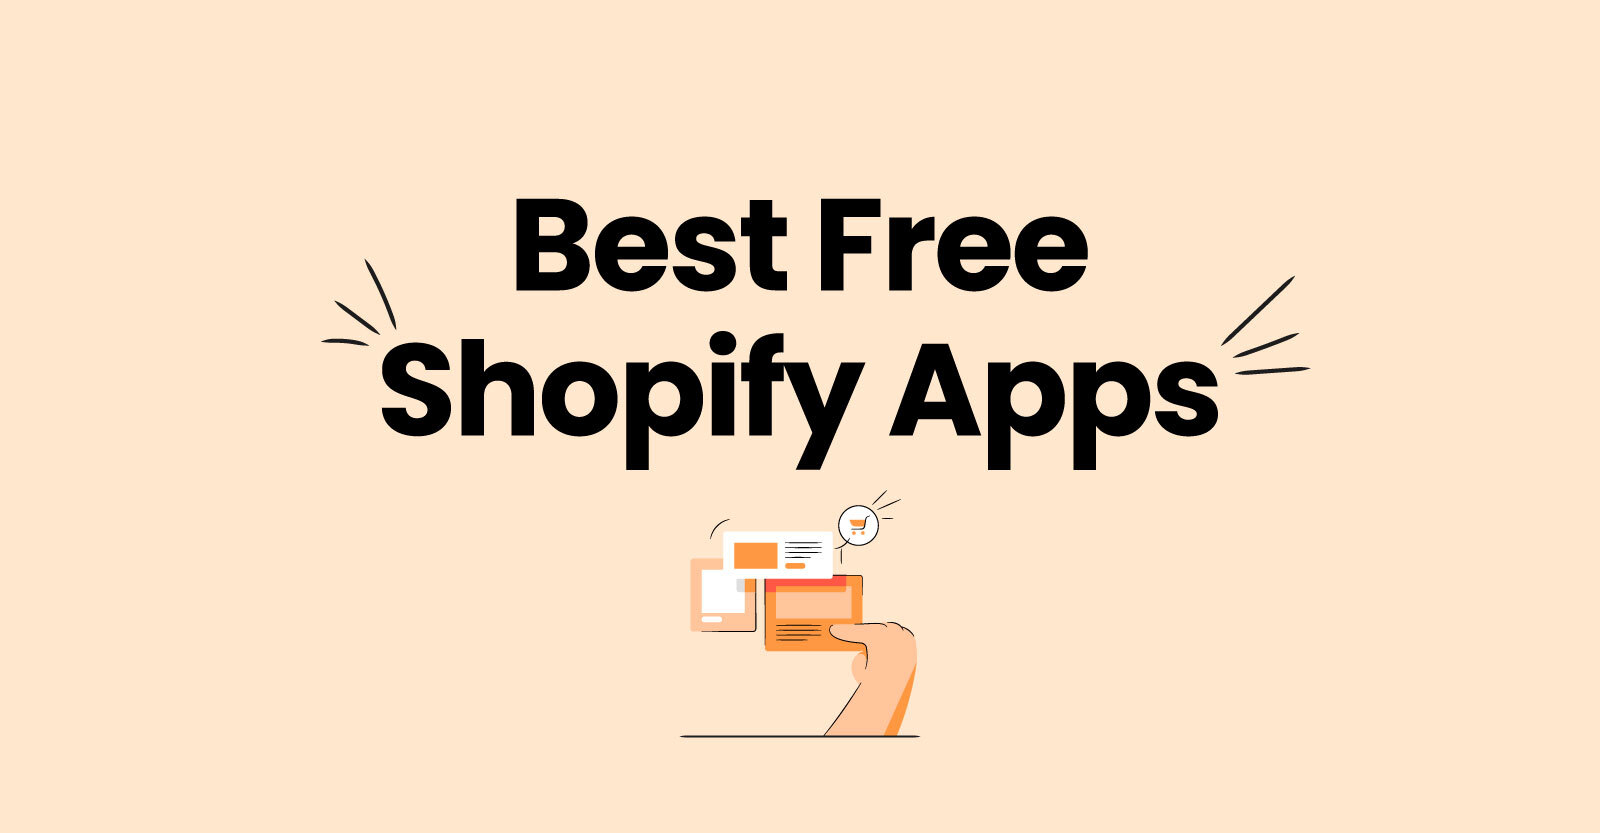 10 Best Free Shopify Apps in 2021